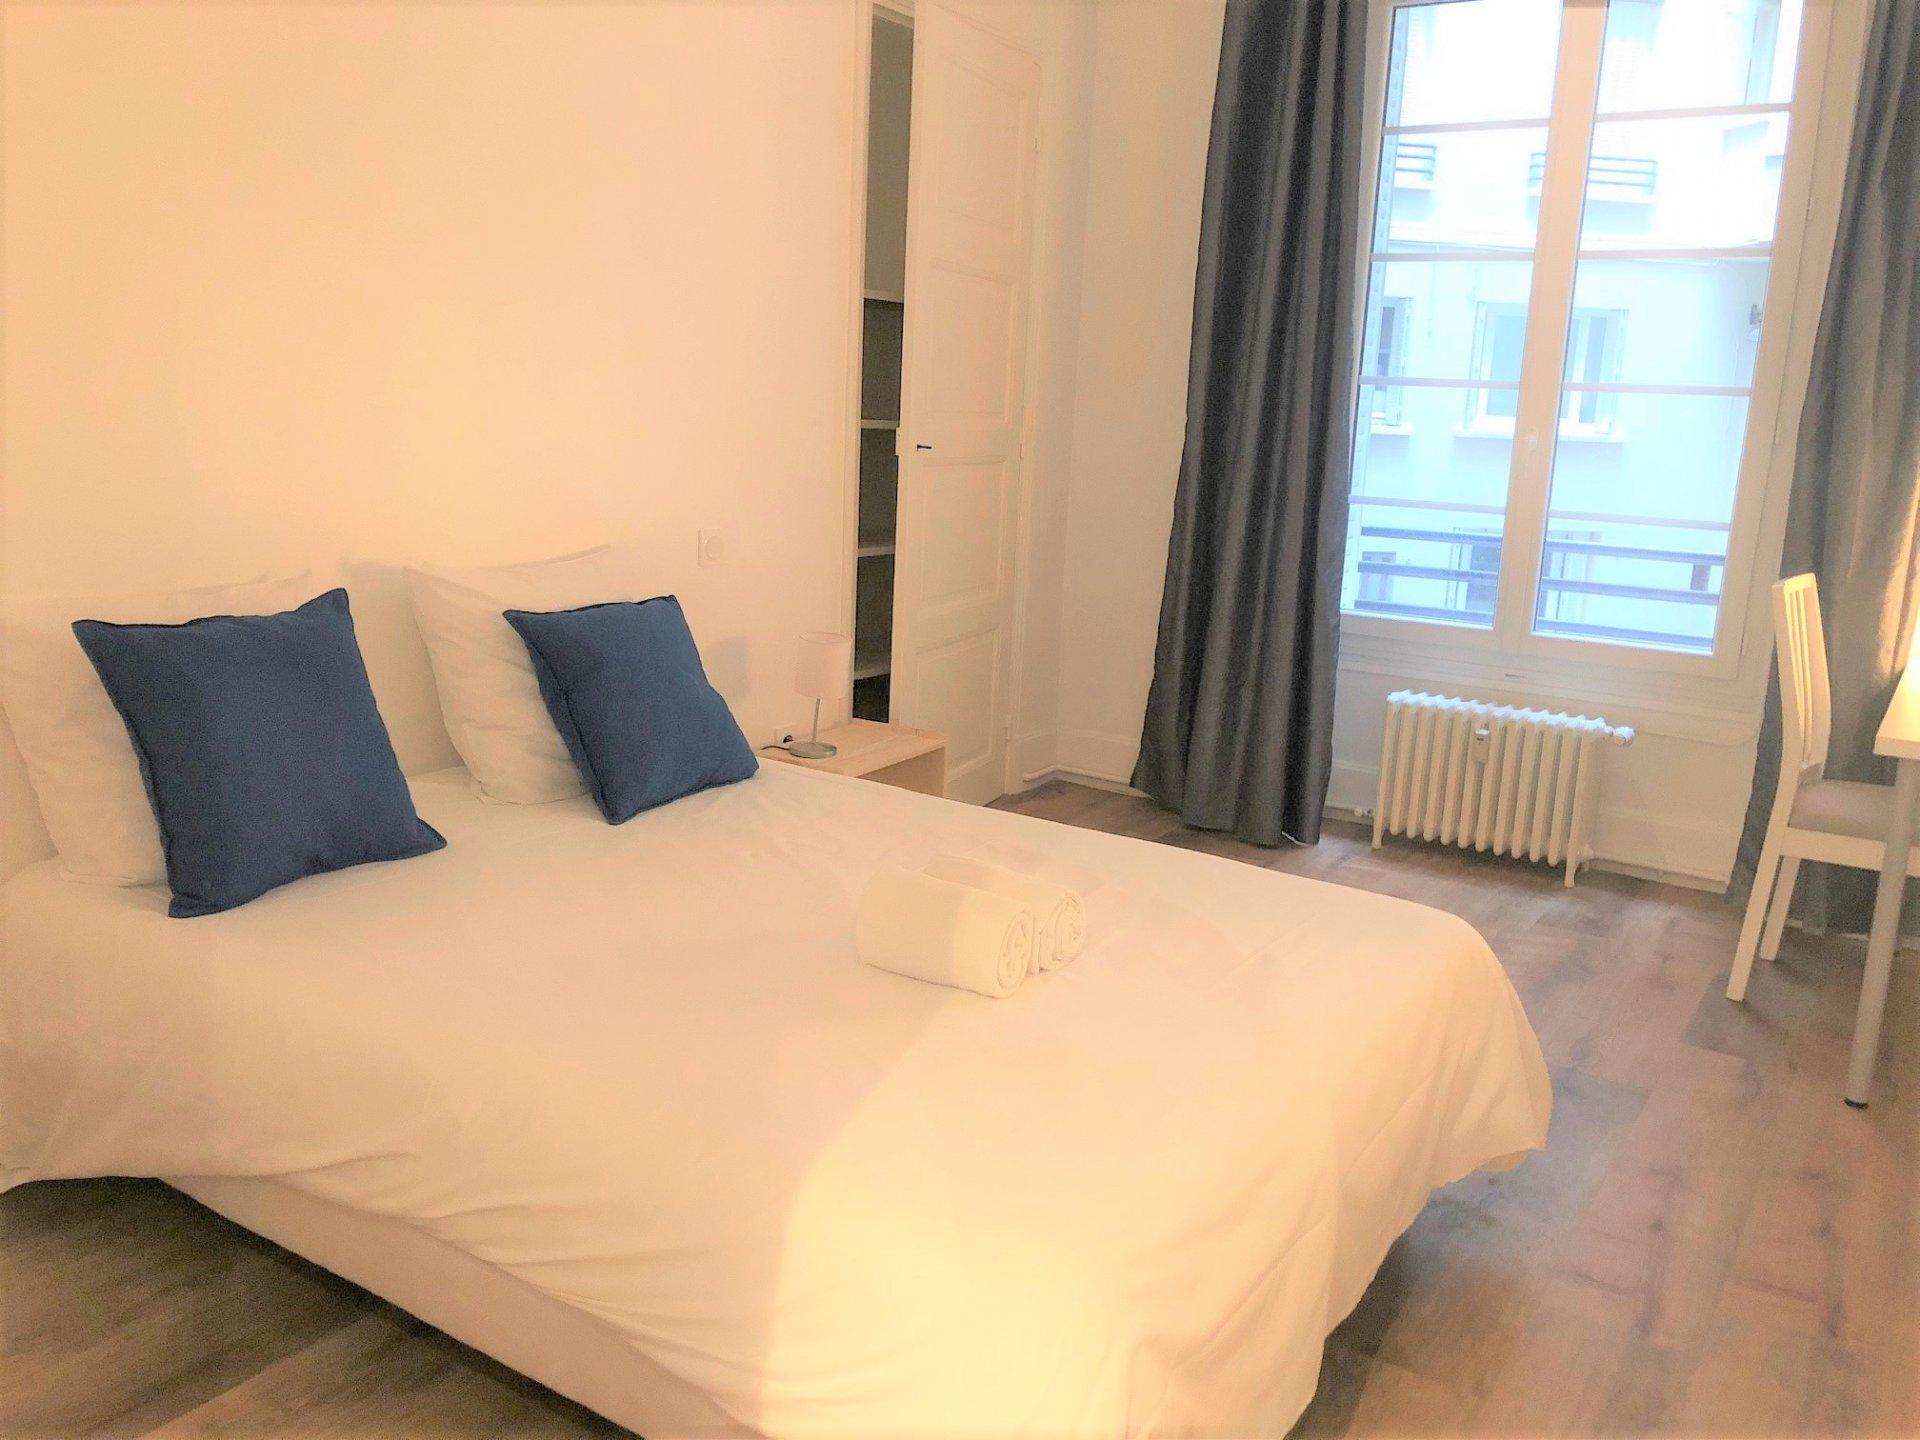 Chambre spacieuse avec rangement moderne